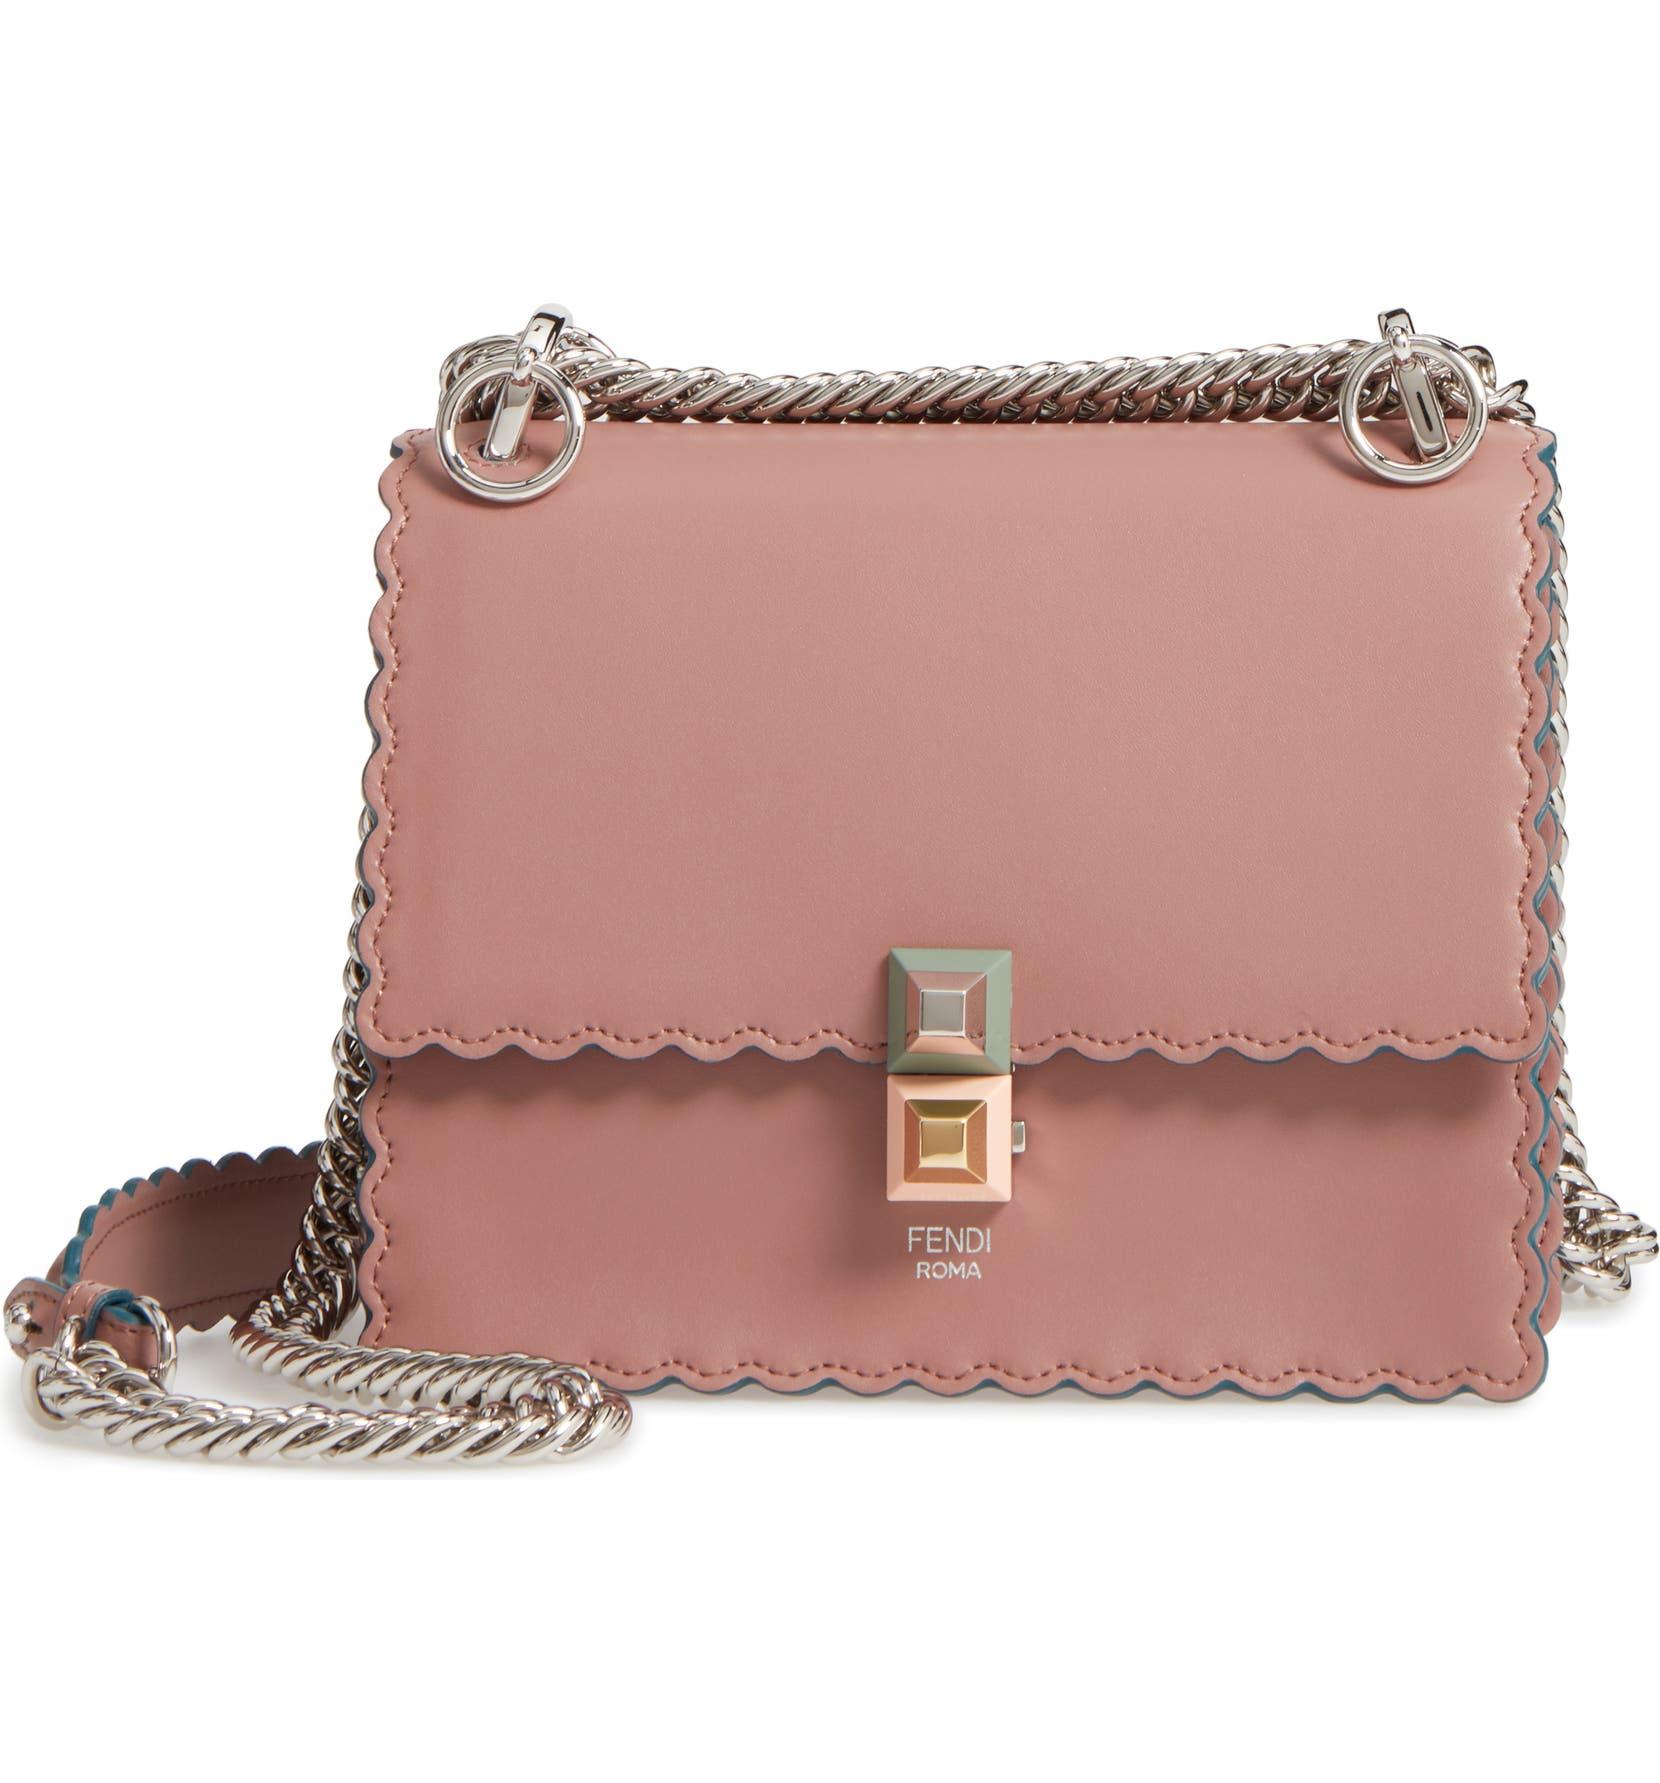 ff8ac4f11a95 Fendi Small Kan I Scallop Leather Shoulder Bag